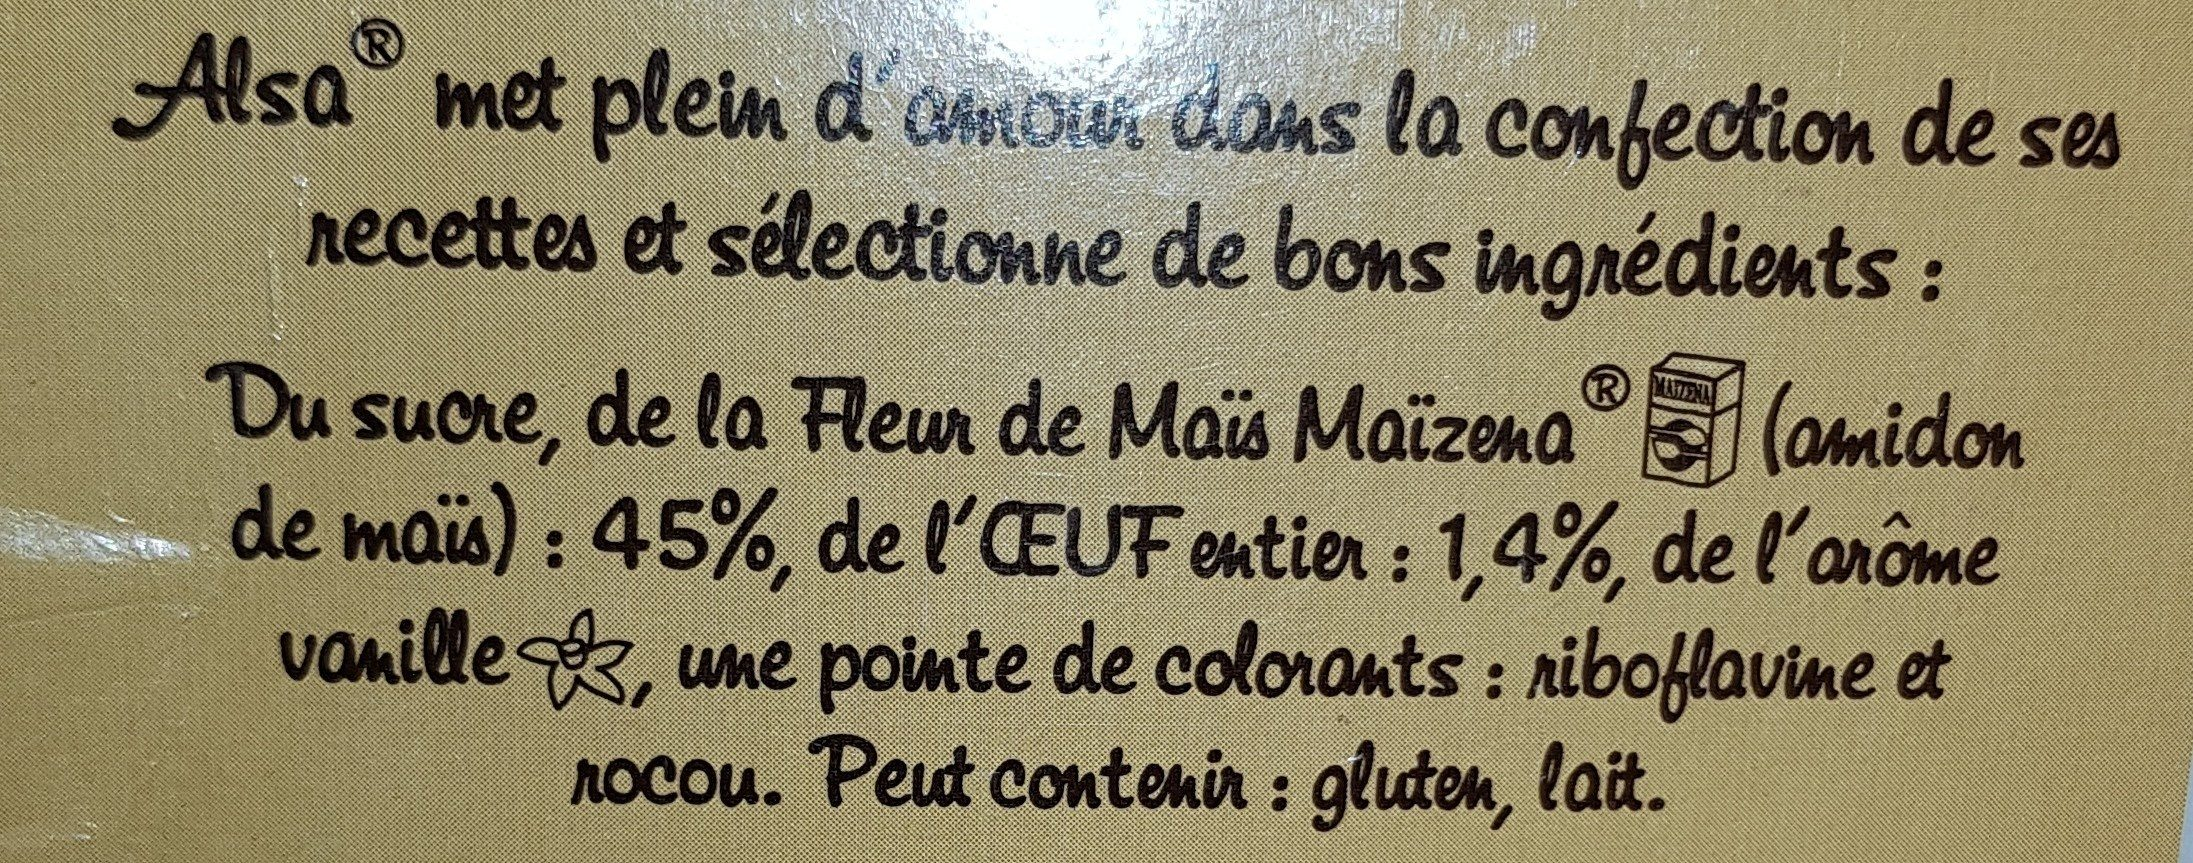 Flan Pâtissier aux oeufs - Ingredients - fr